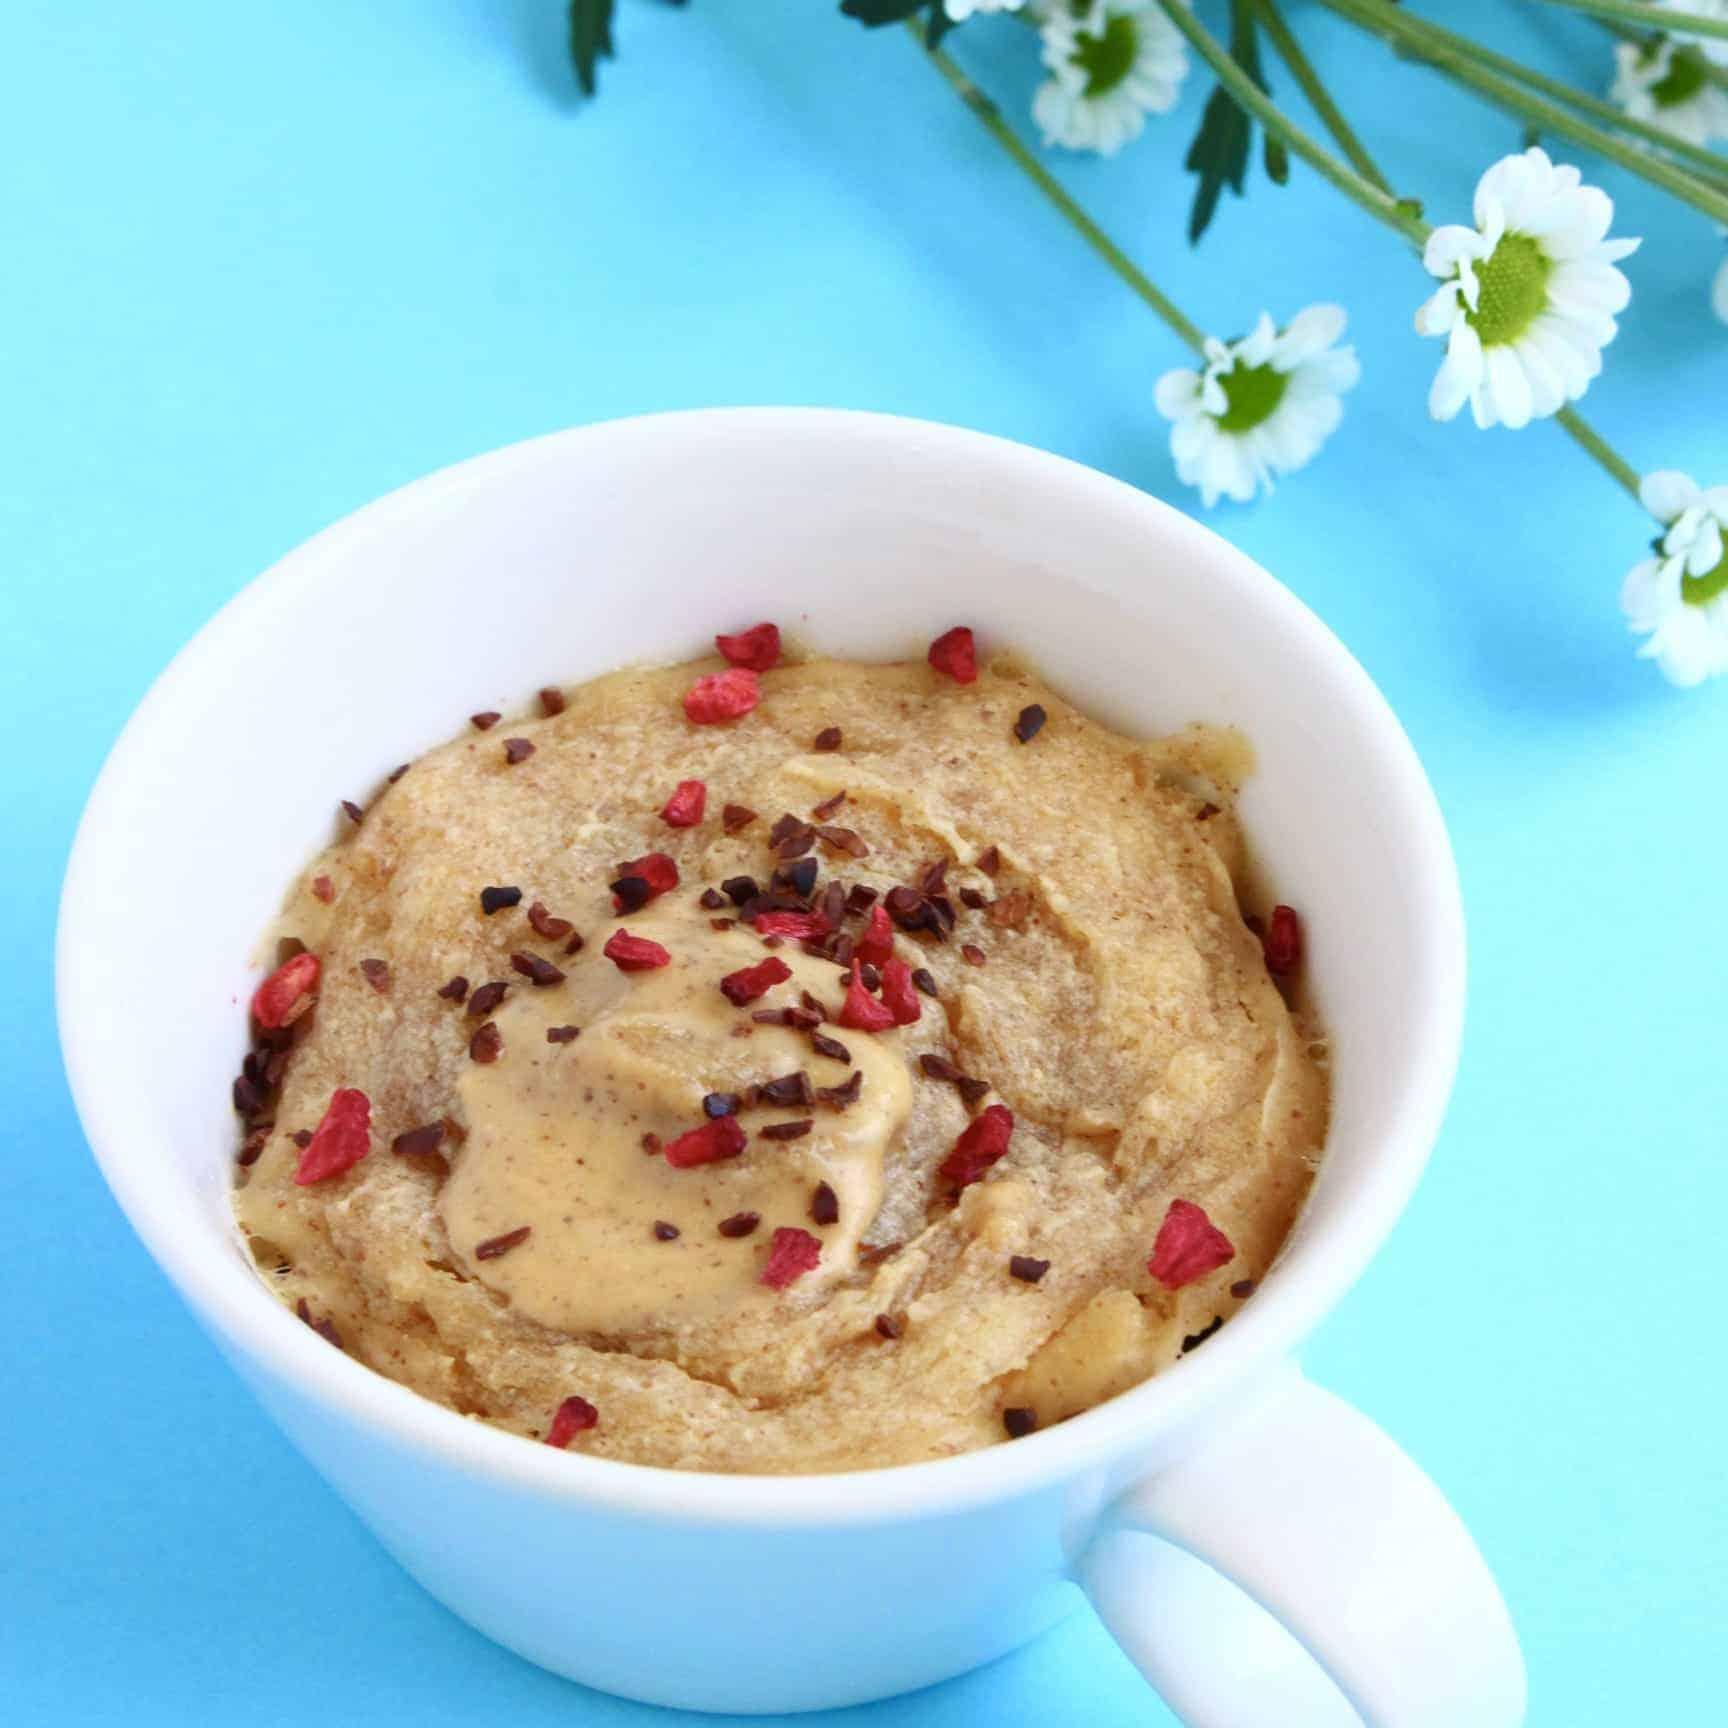 Vegan Peanut Butter Microwave Mug Cake 3 Ingredients Rhian S Recipes